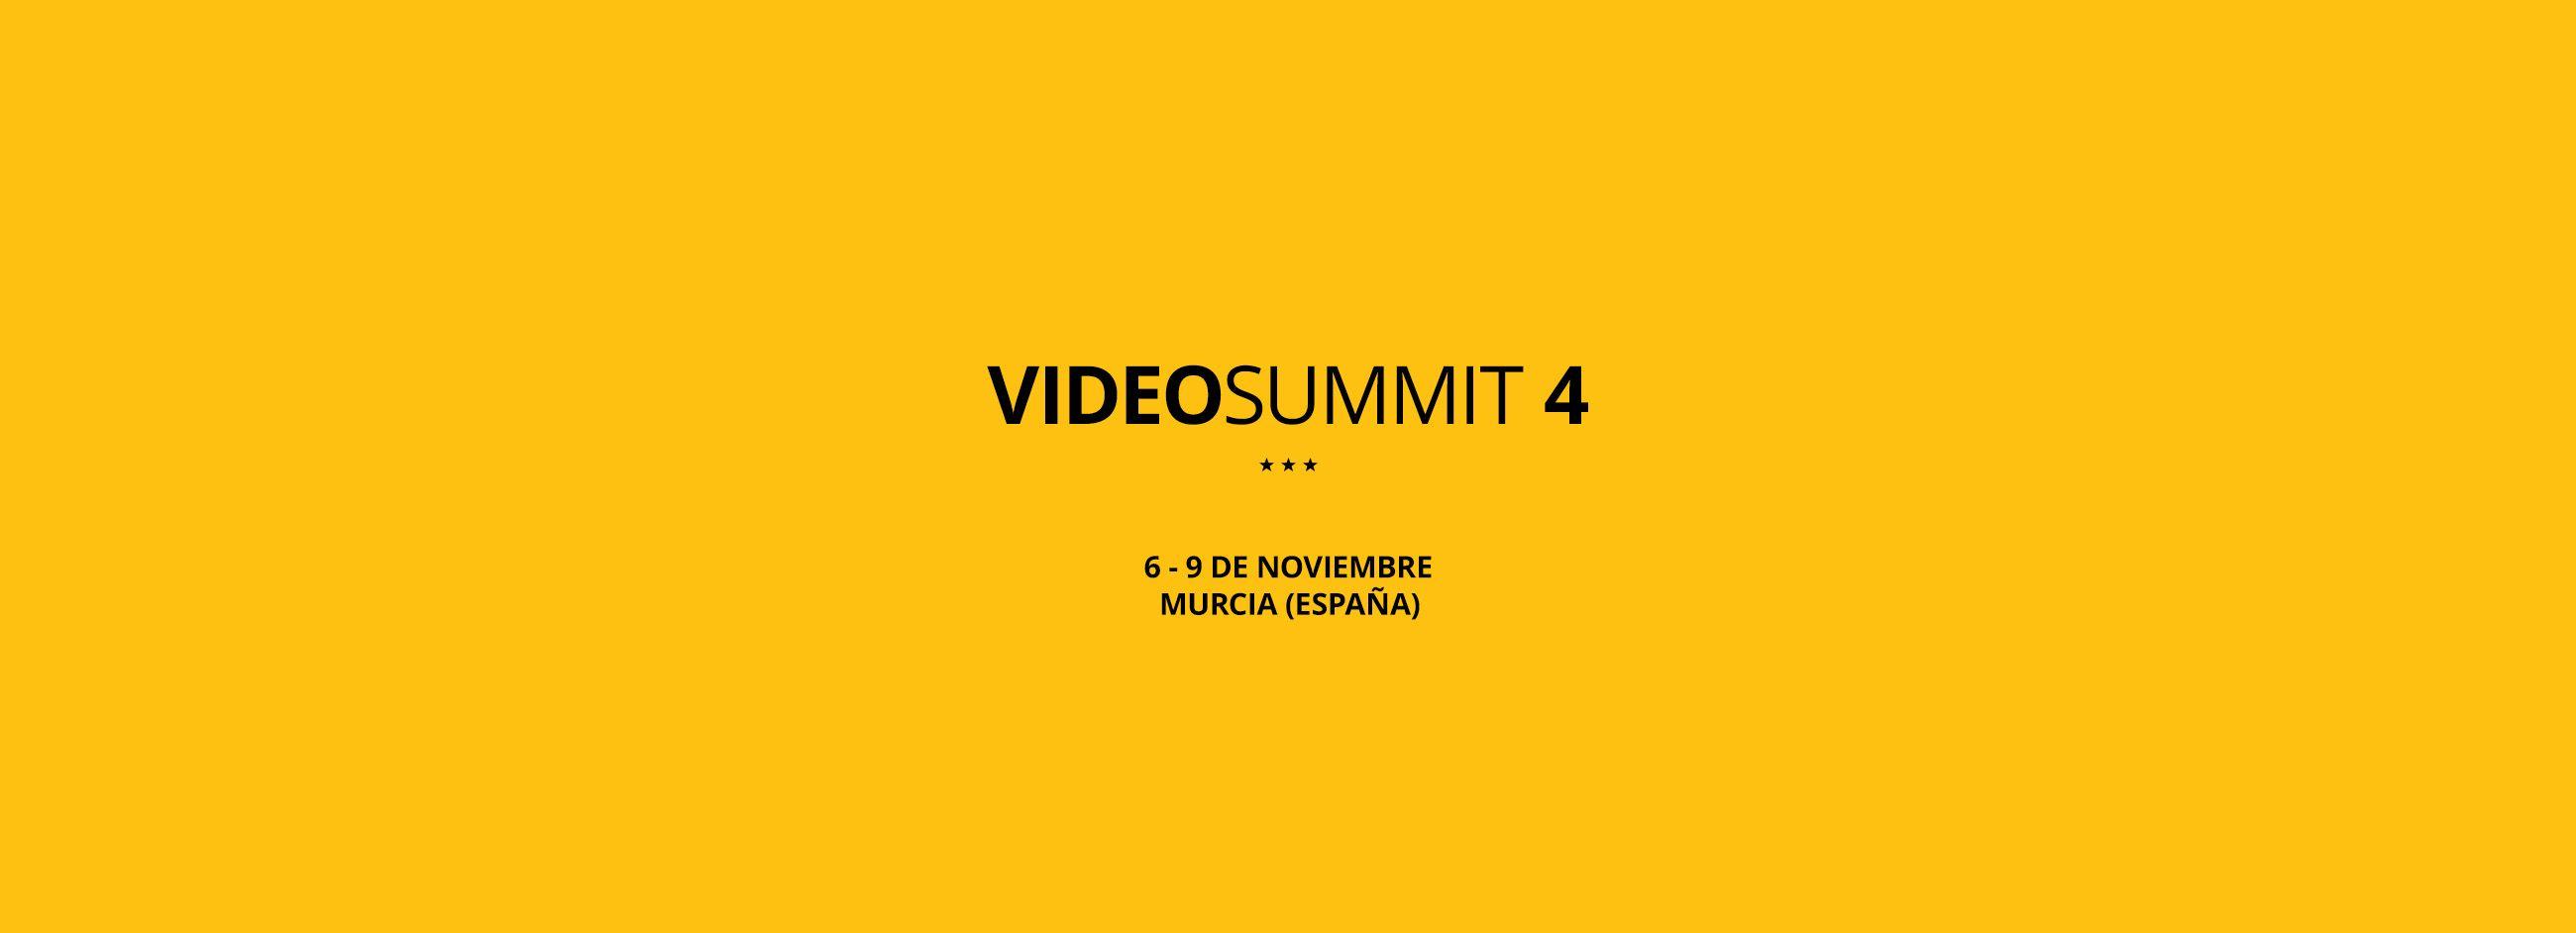 VideoSUMMIT 4 Club de Videografos